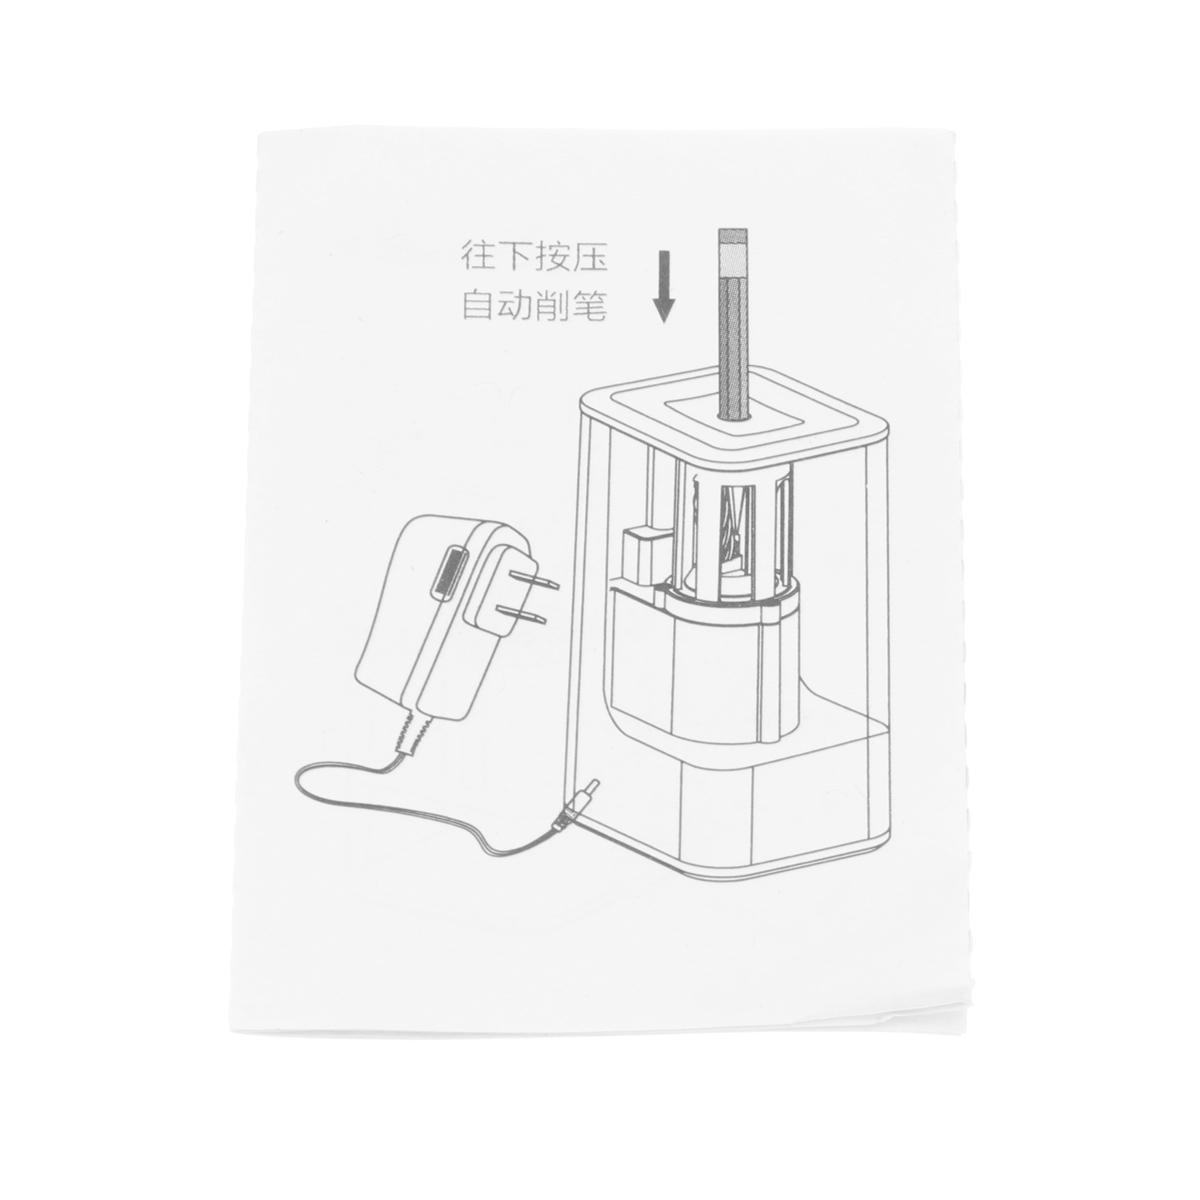 ac 100-240v 50/60hz automatic electric pencil sharpener